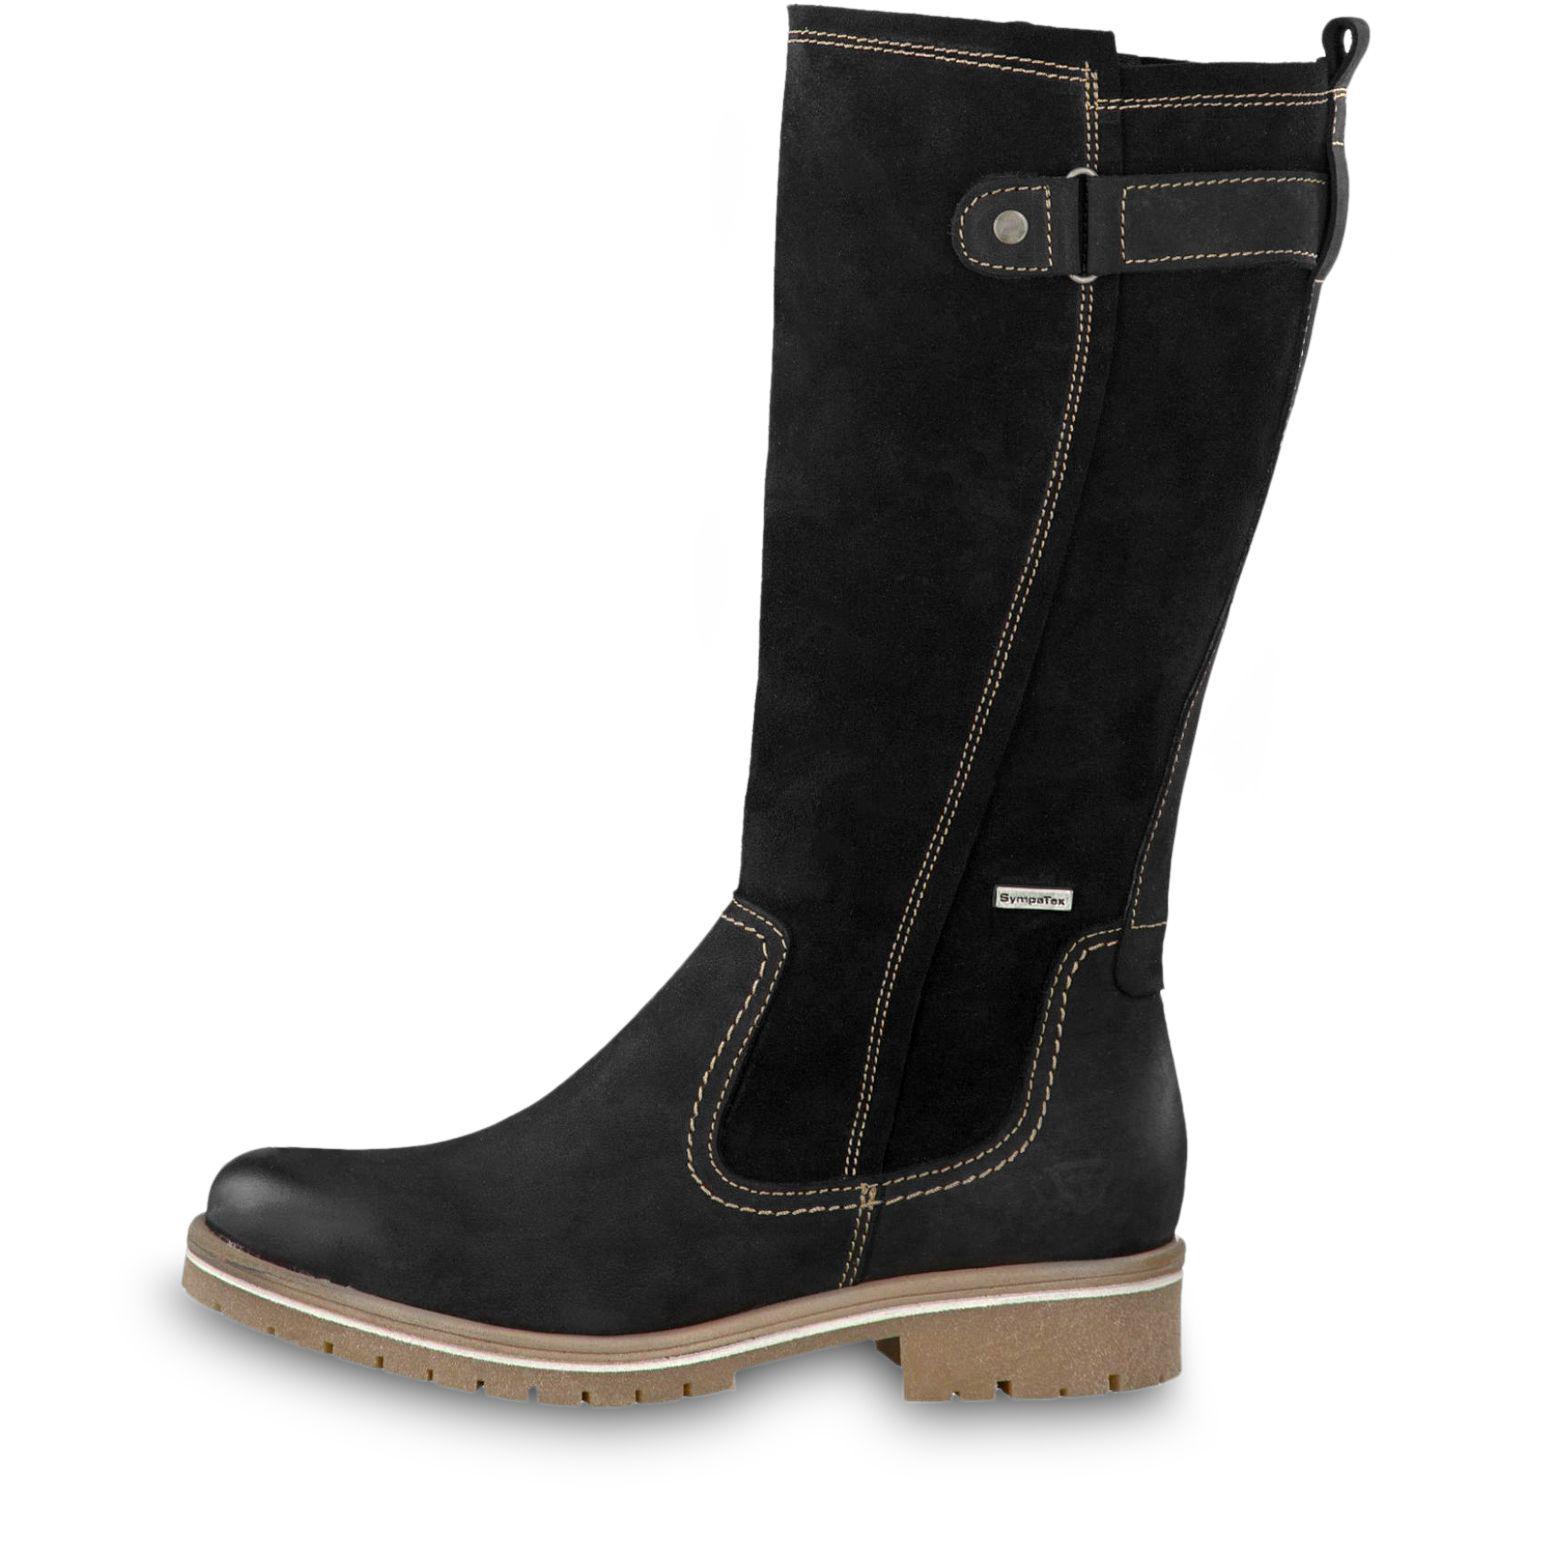 Sympatex Tamaris Stiefel Boots Stiefel Boots Tamaris Sympatex wPn80Ok